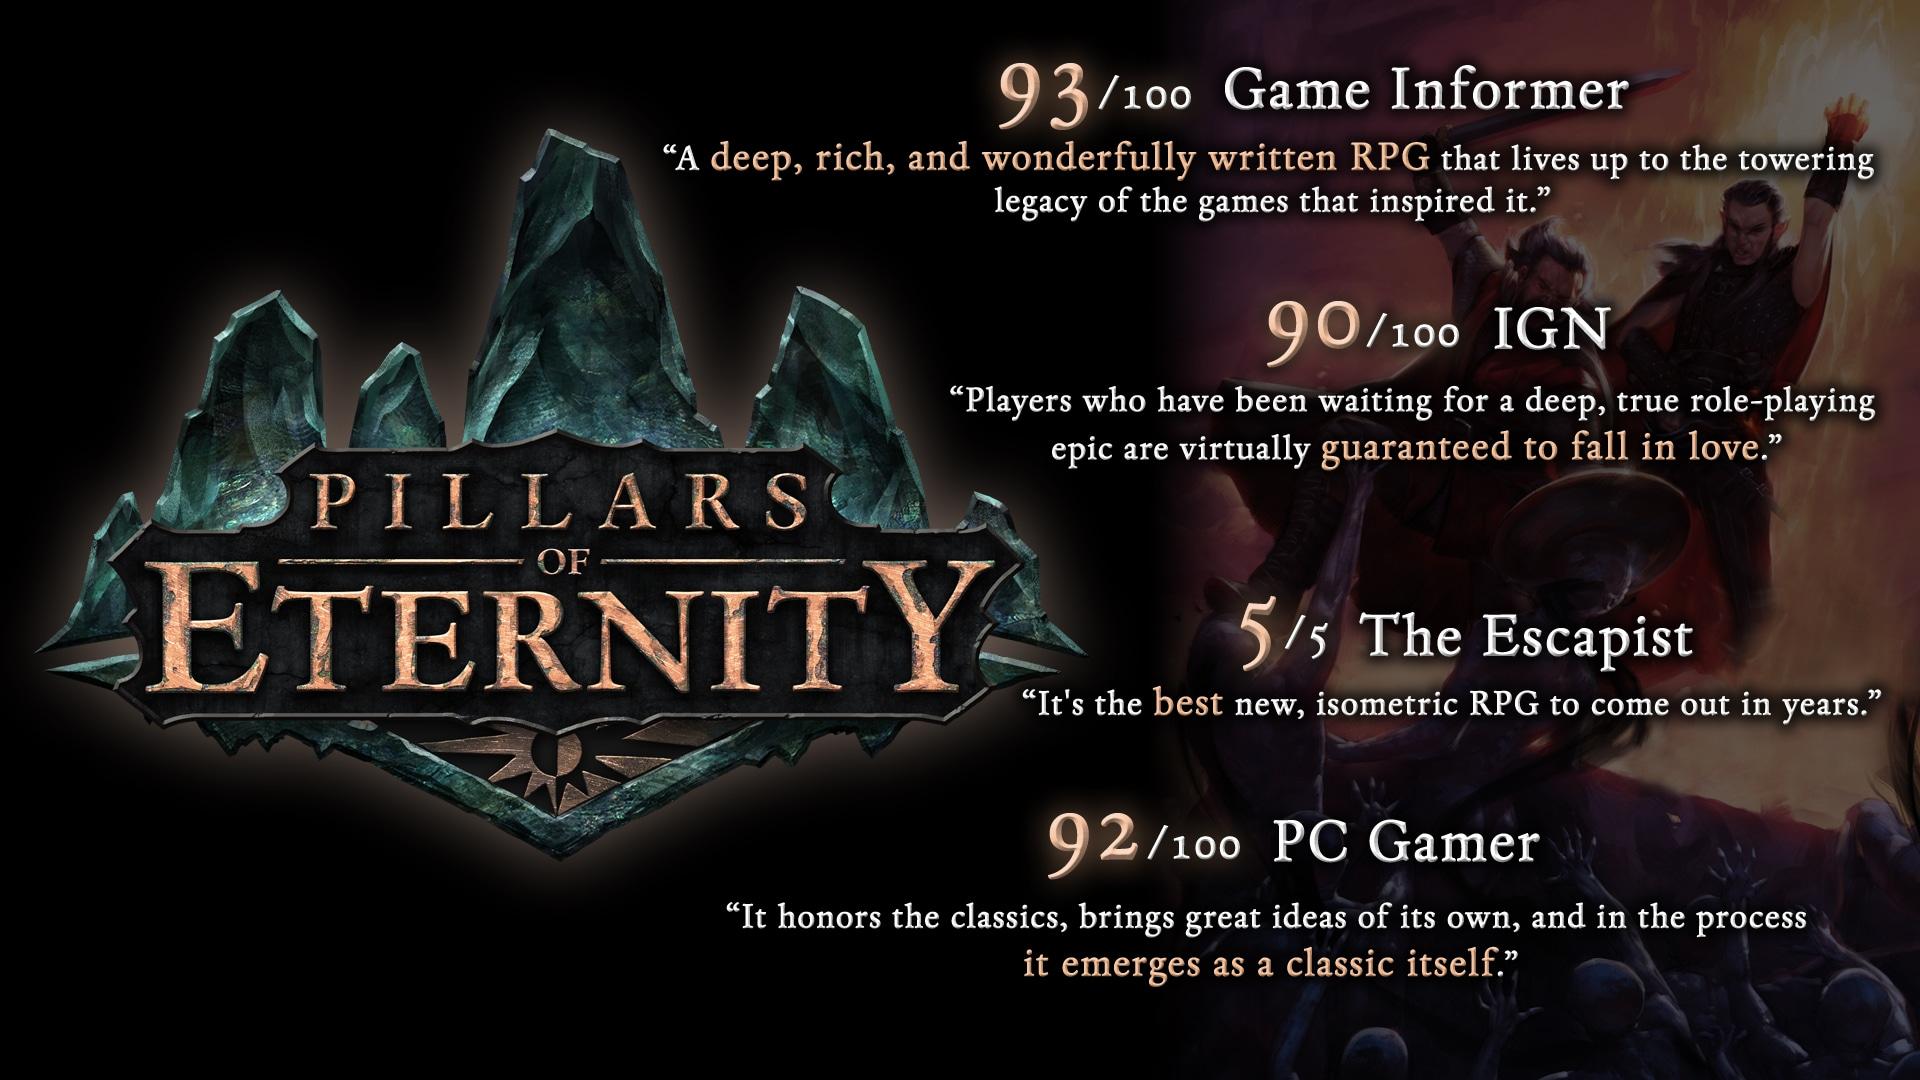 Pillars of Eternity - Definitive Edition (PC) - Steam Key - GLOBAL - 3